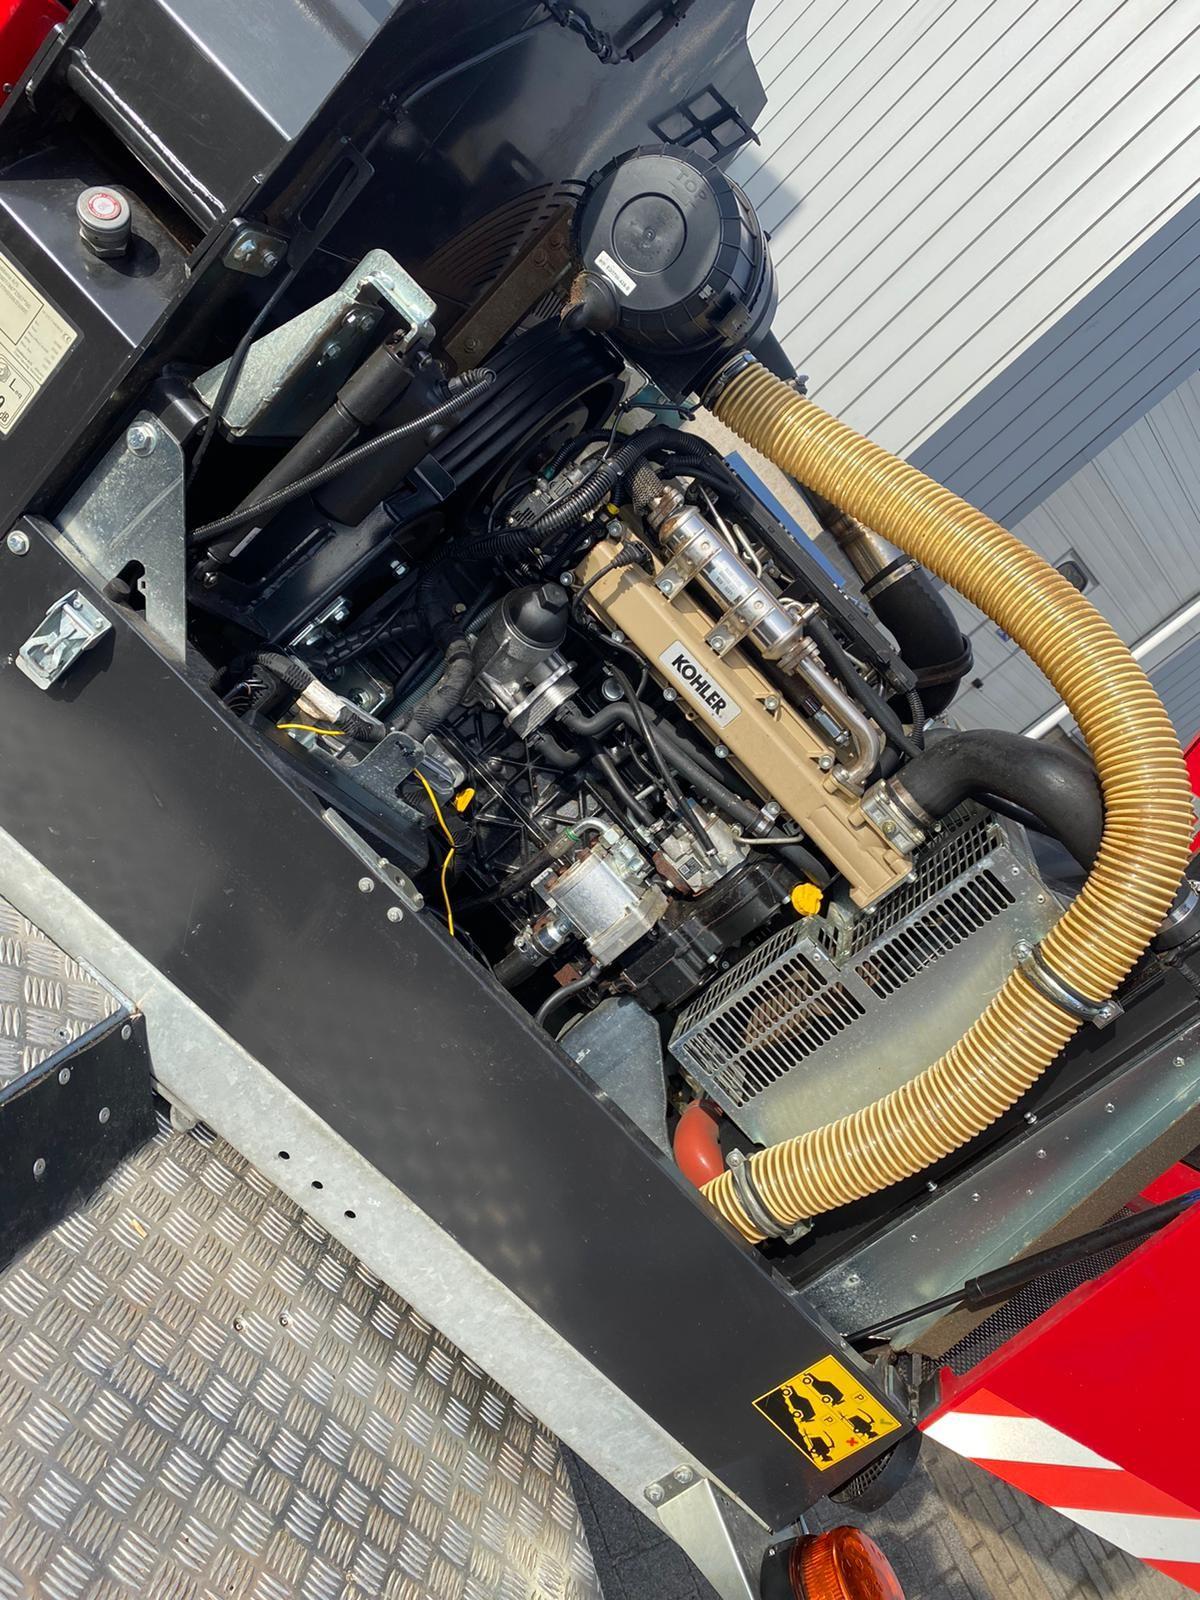 Vernsipperaar TP 275 MOBILE BJ 12-2017 232 uur 27.5 cm